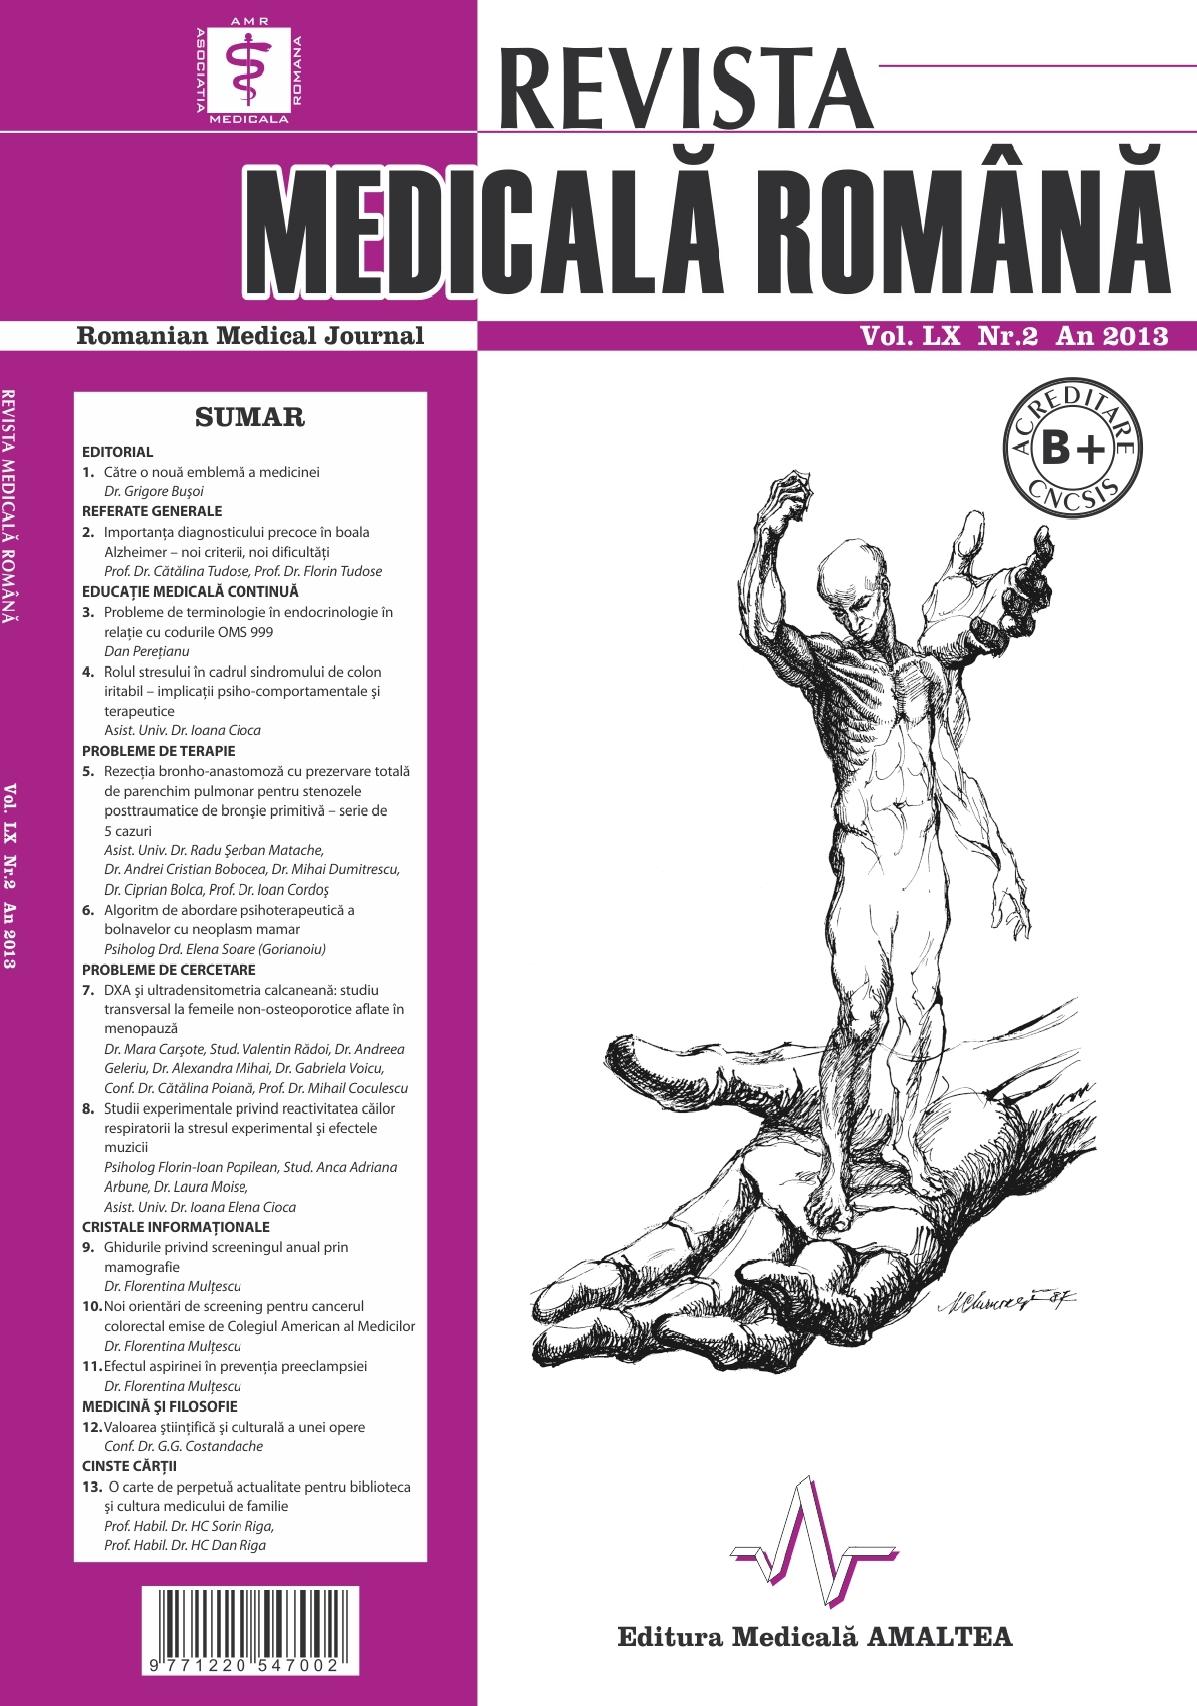 REVISTA MEDICALA ROMANA - Romanian Medical Journal, Vol. LX, Nr. 2, An 2013